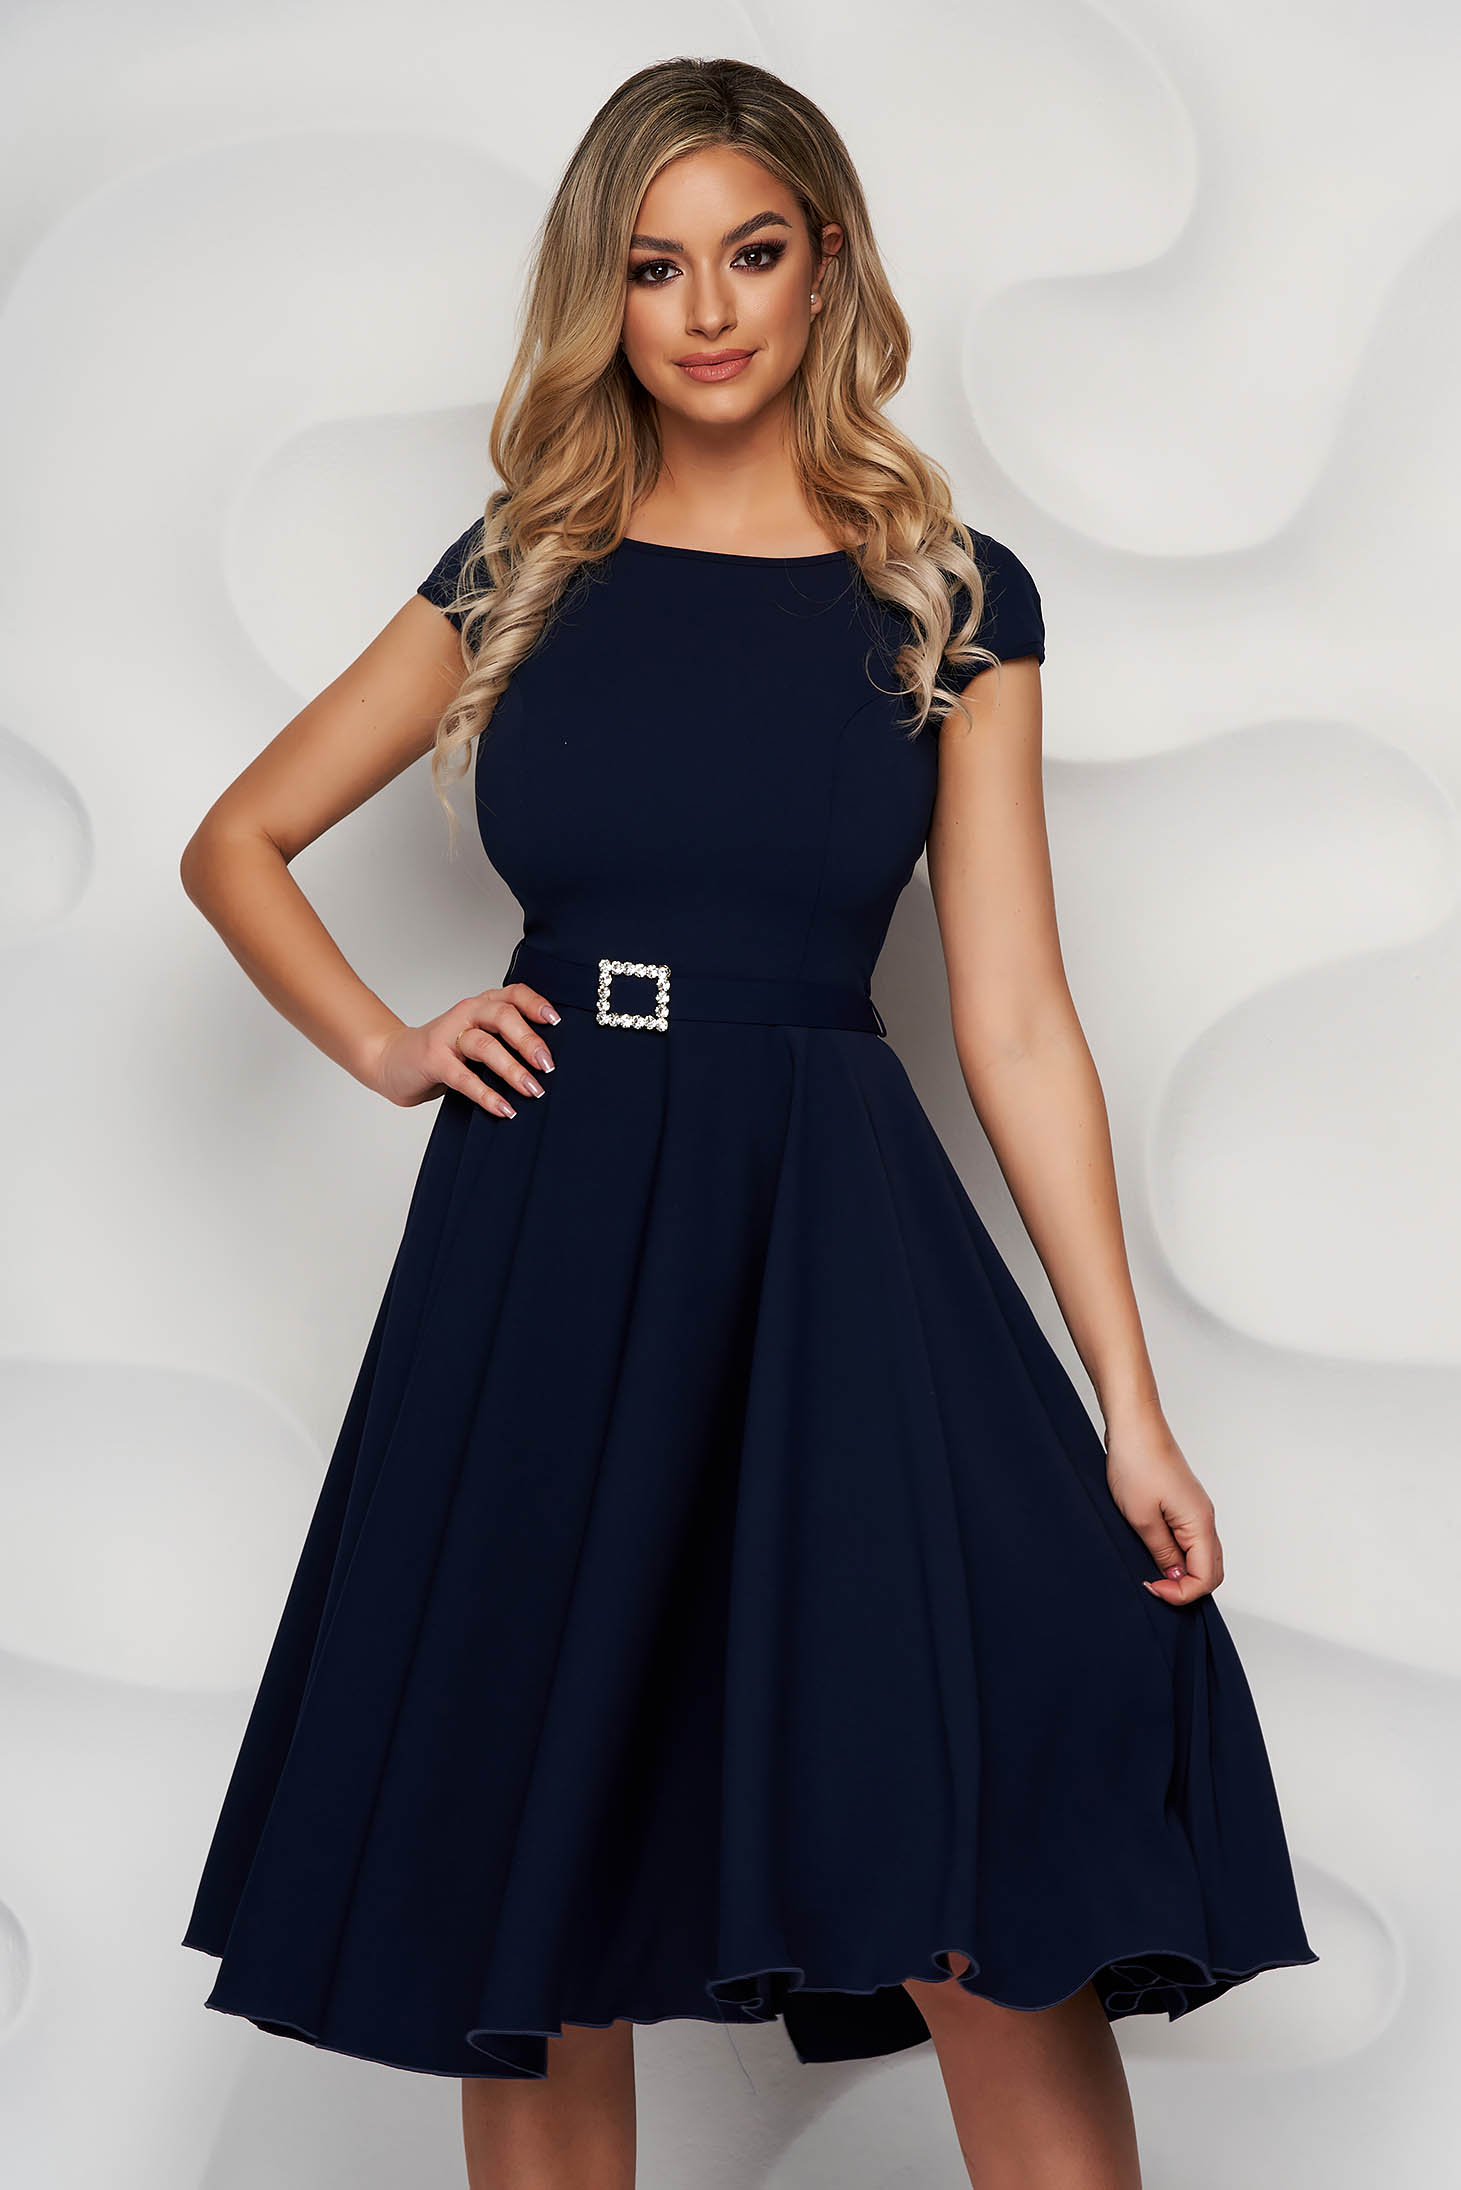 Rochie StarShinerS albastru-inchis eleganta midi din stofa accesorizata cu o centura